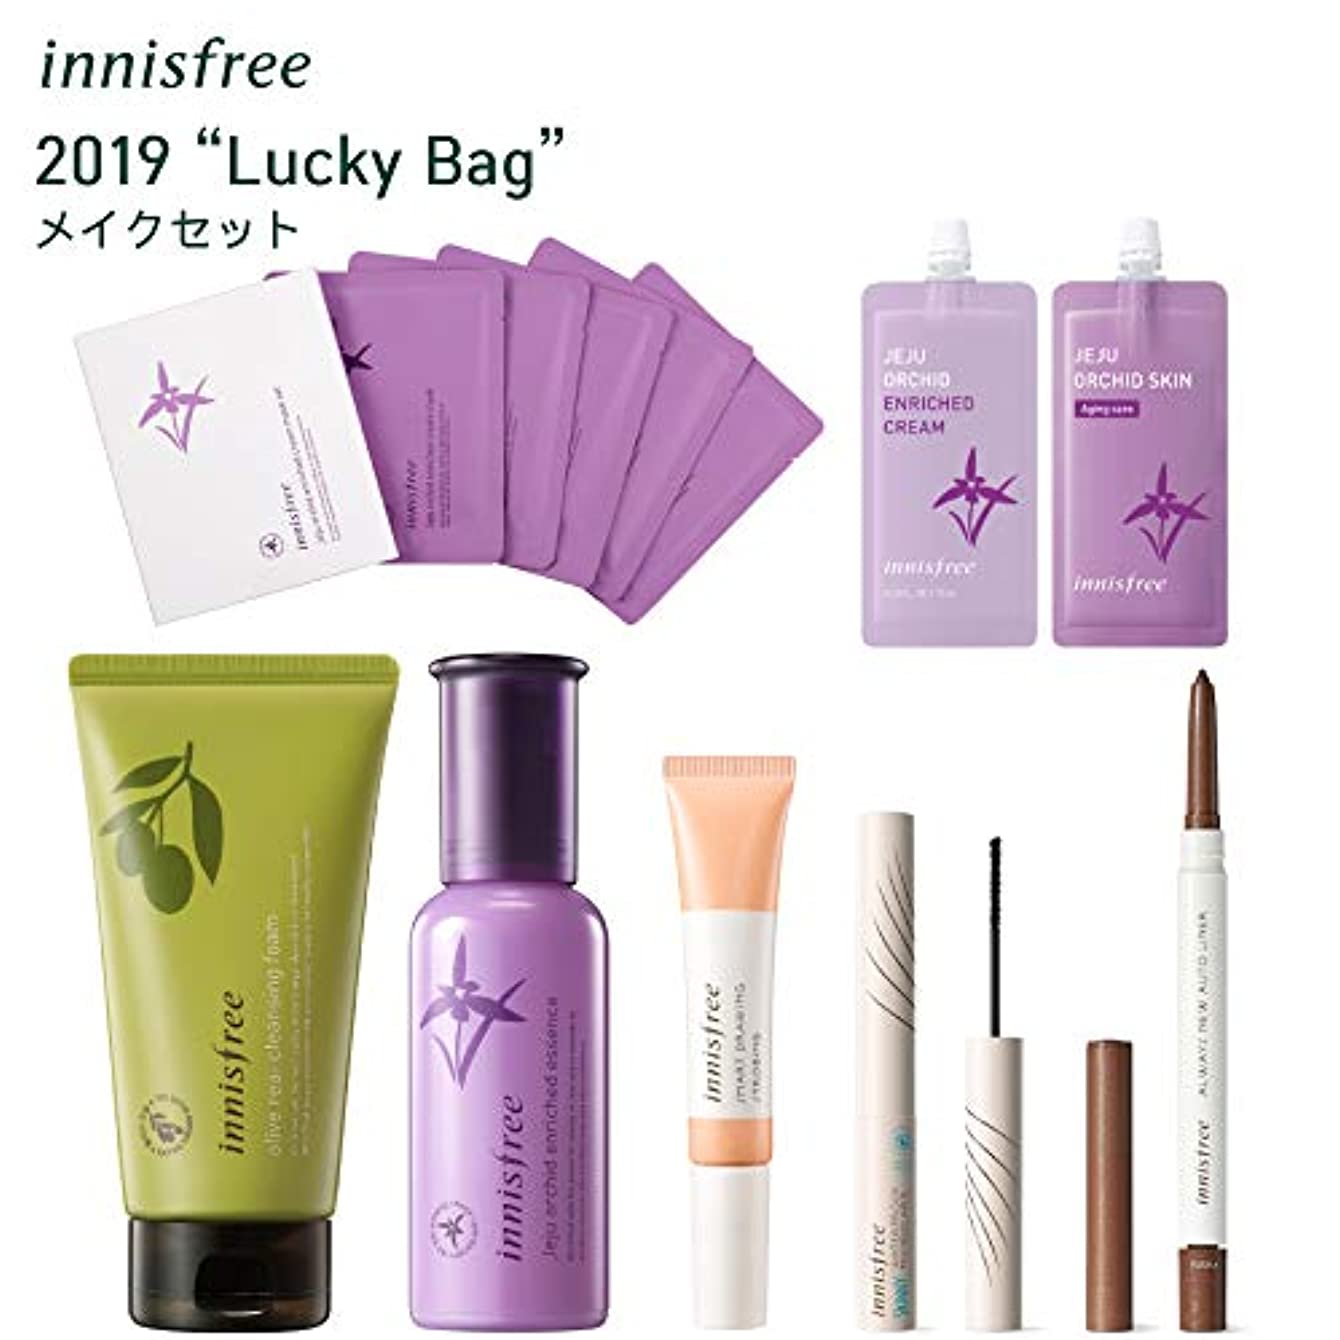 【Amazon.co.jp 限定】イニスフリー日本公式(innisfree)Lucky Bag 2019(メイク)[福袋]